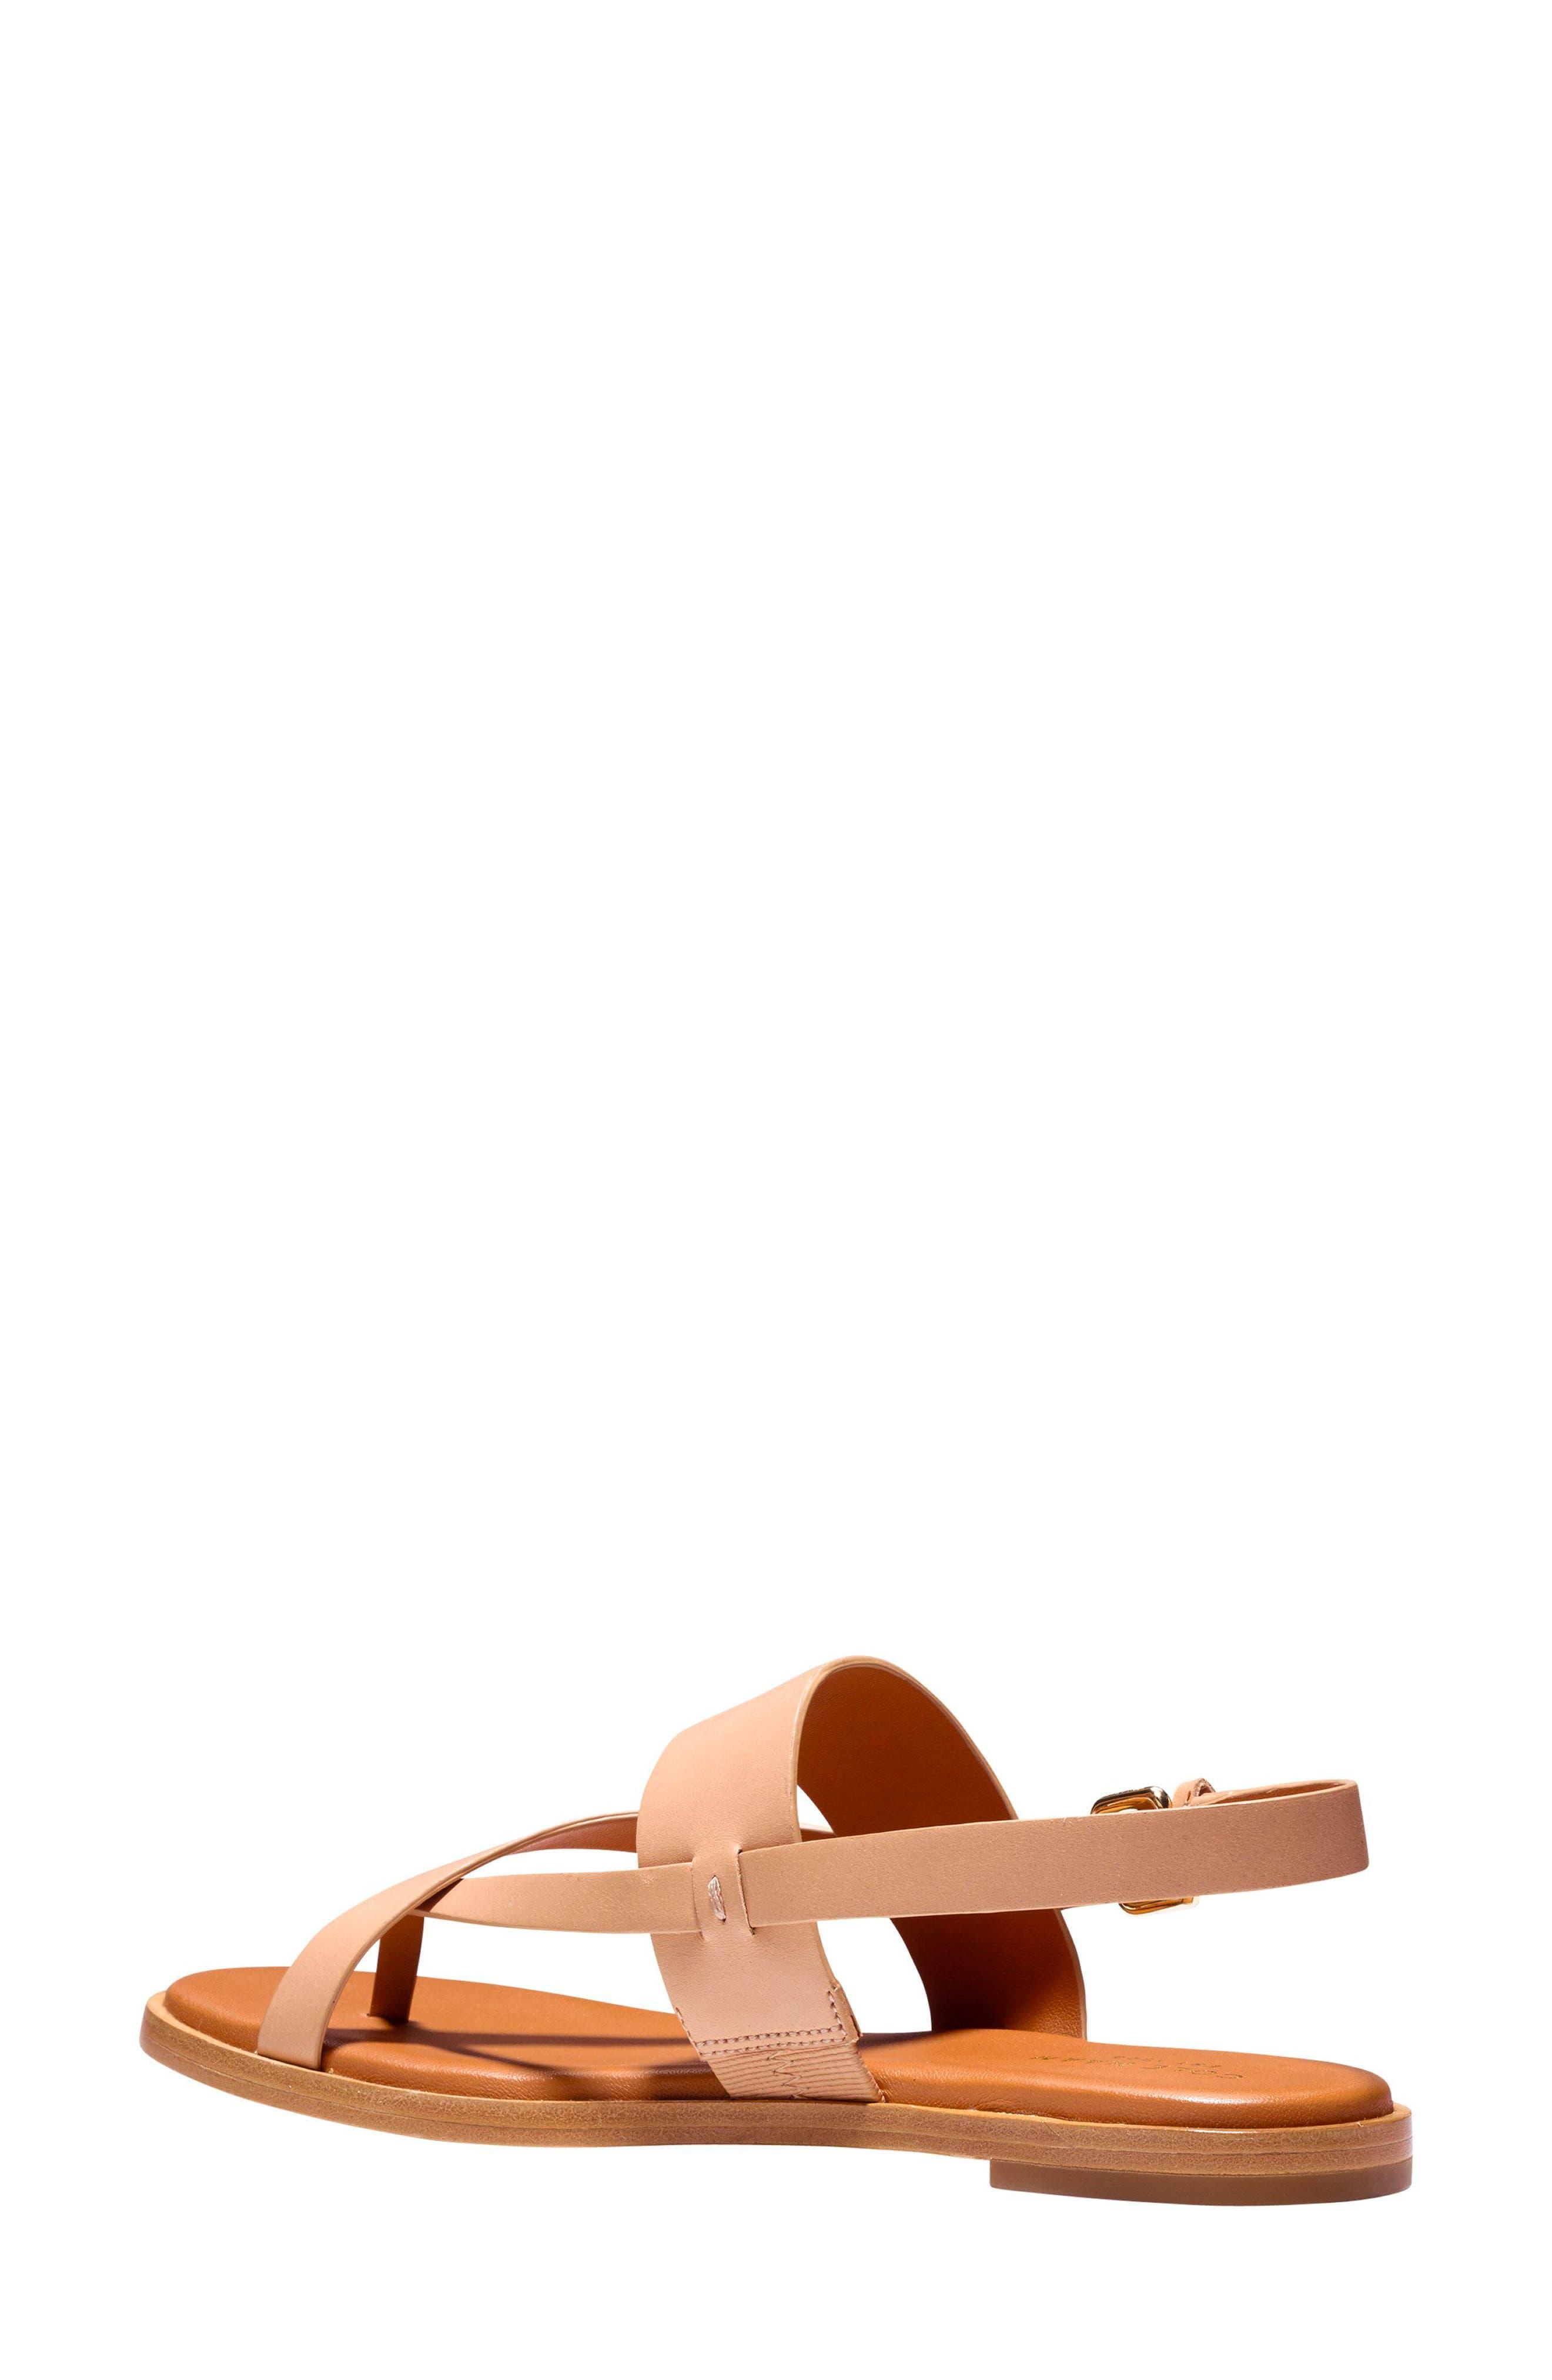 Anica Sandal,                             Alternate thumbnail 2, color,                             Sahara Leather